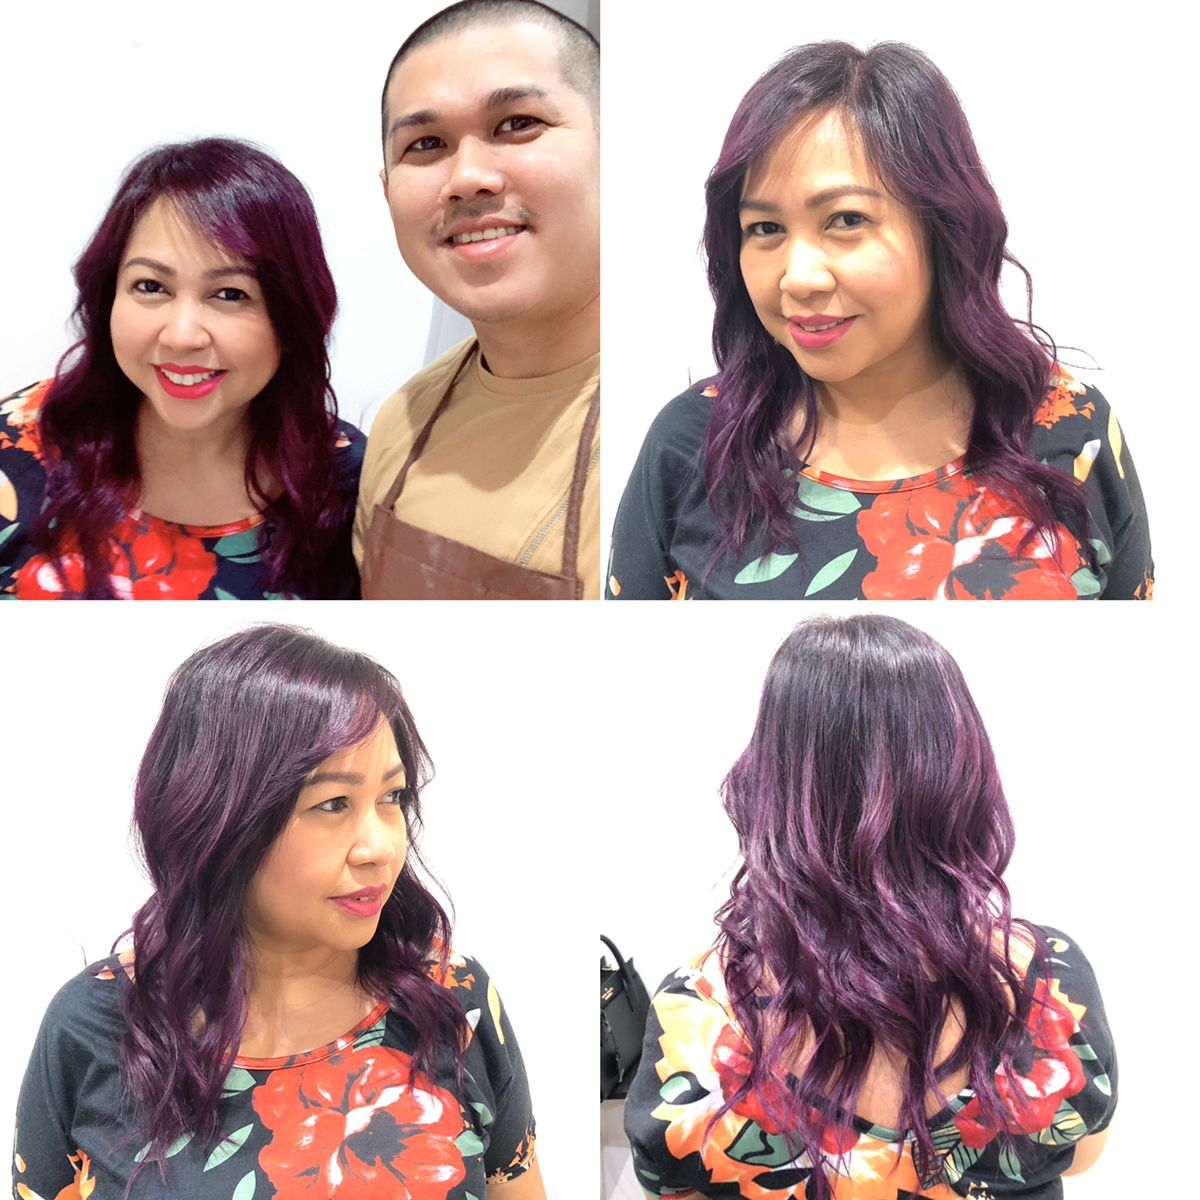 Pin By Michael Diaz On Strands Hair Studio Hair Studio Hair Studio